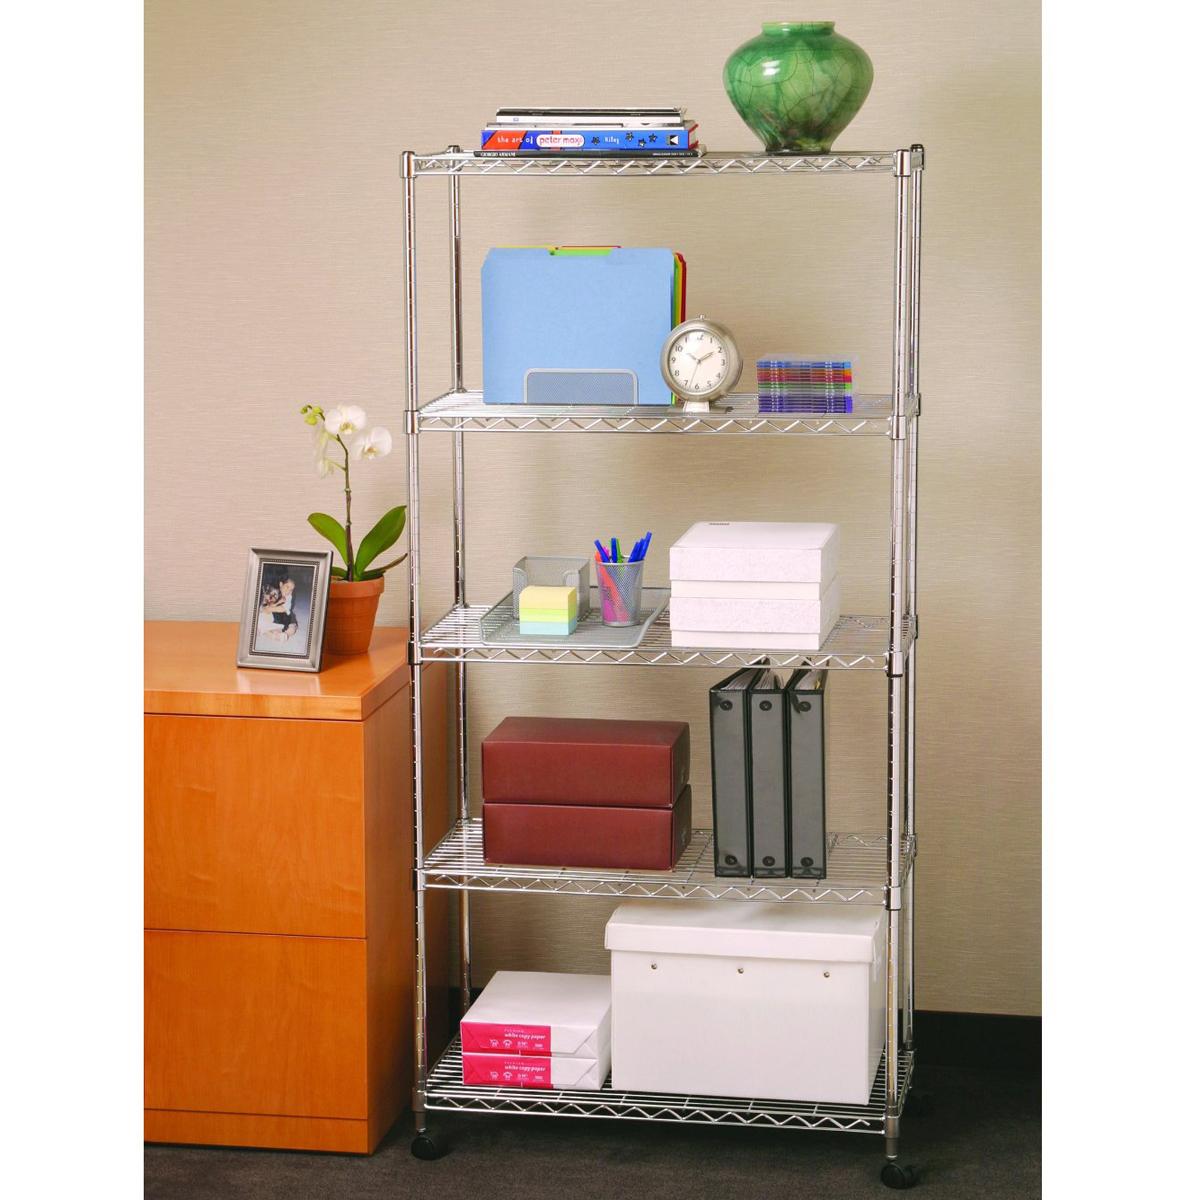 Kitchen Storage Shelves: Wire Metal Shelving Storage With Wheels X5 Tier Shelf